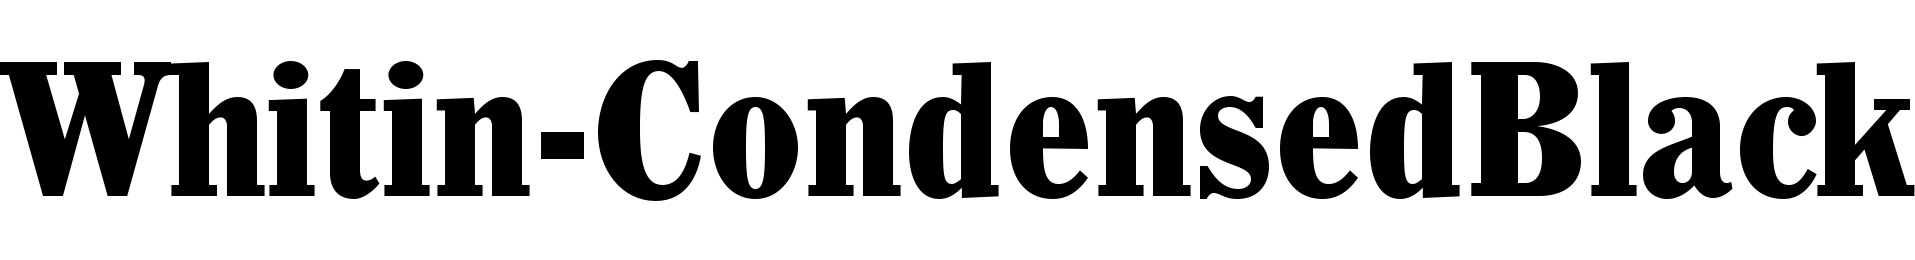 Whitin-CondensedBlack